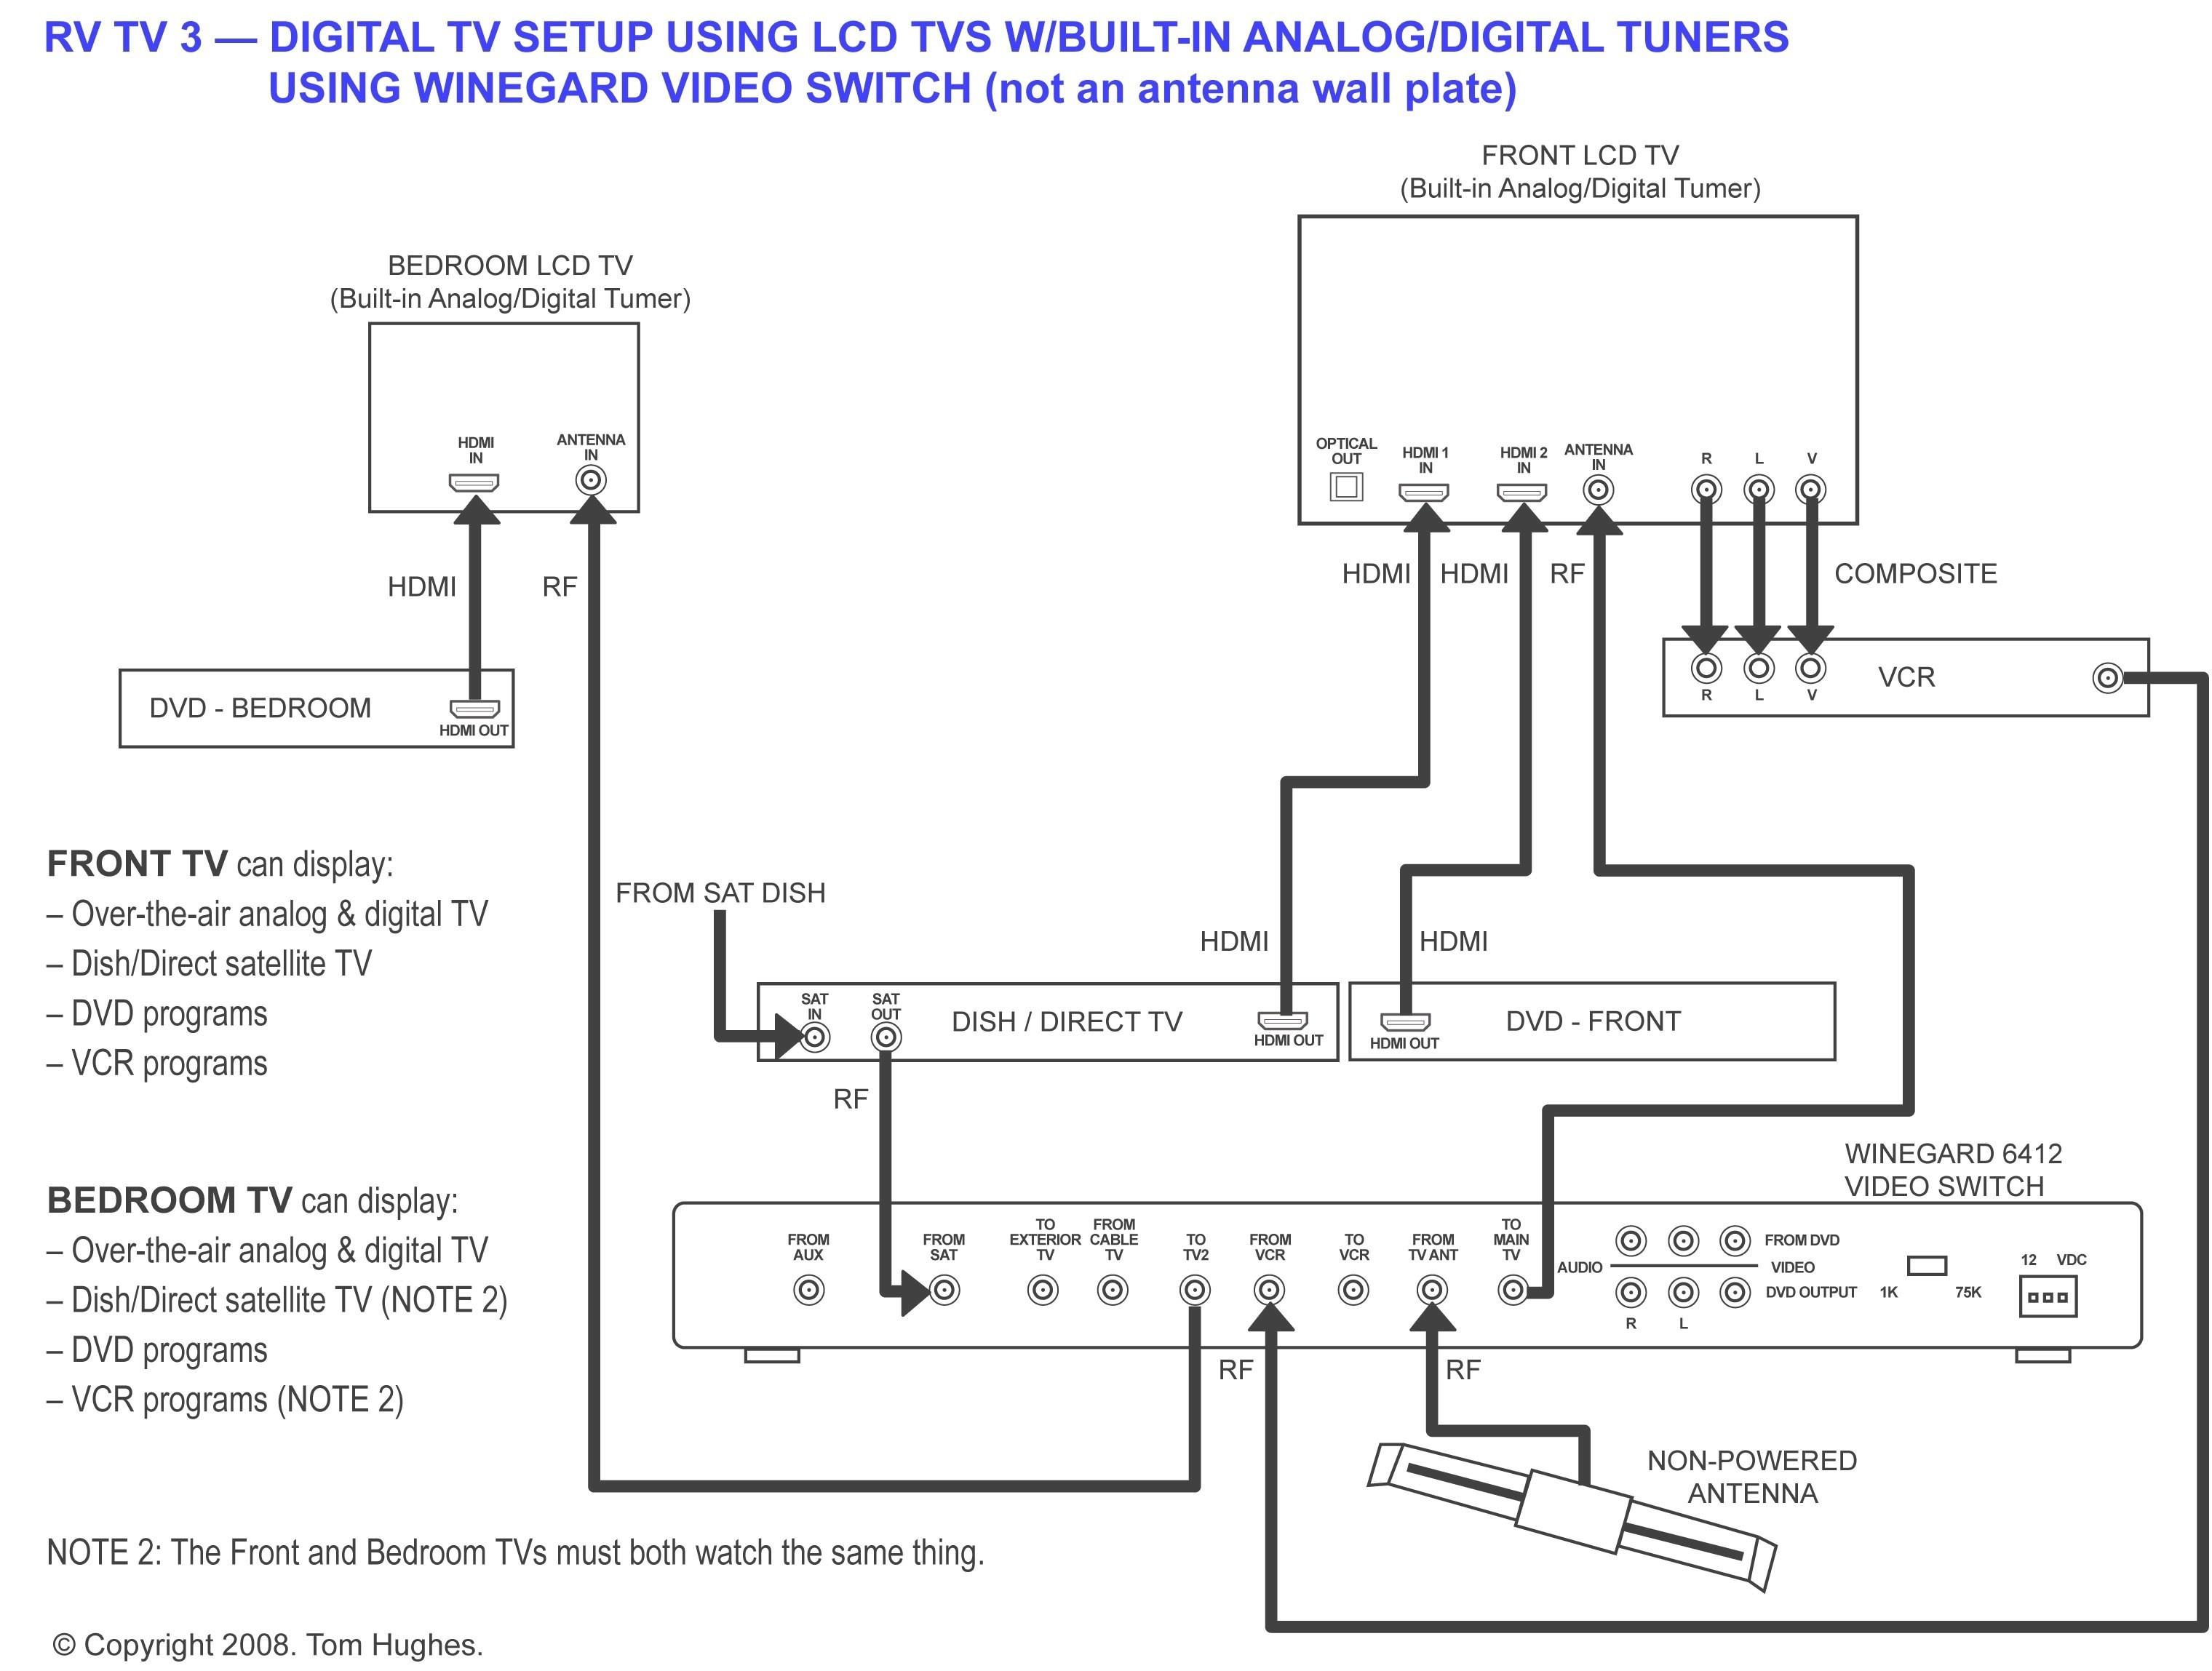 Dishhd Wiring Schematic 1997 Gmc Sierra Wiring Harness 1991rx7 Ati Loro1 Jeanjaures37 Fr